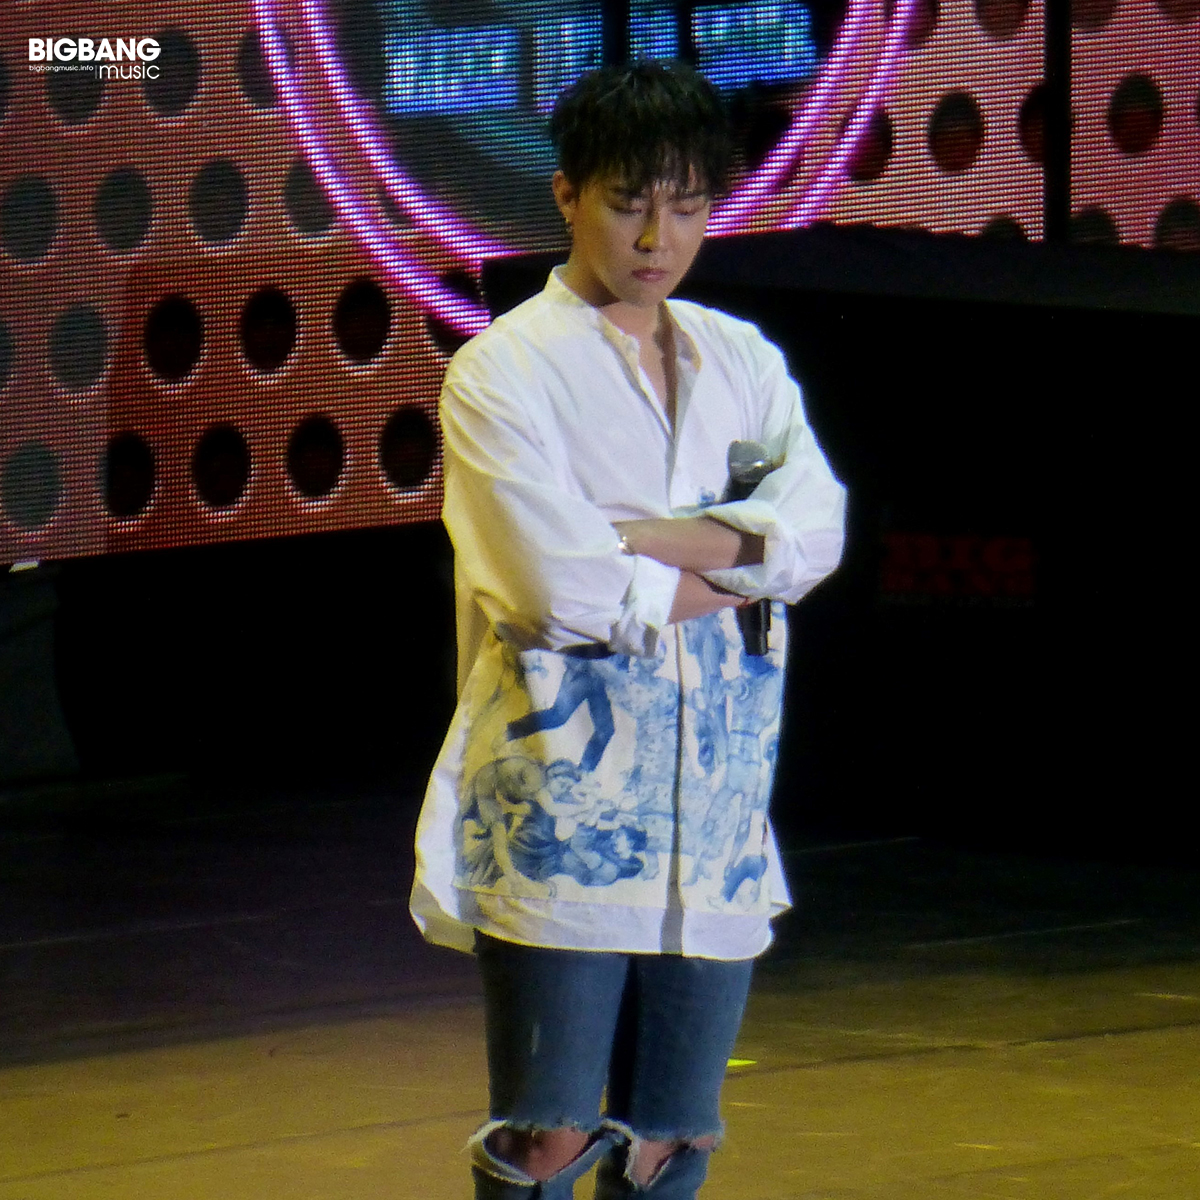 BIGBANGmusic-BIGBANG-FM-Hong-Kong-Day-2-2016-07-23-08